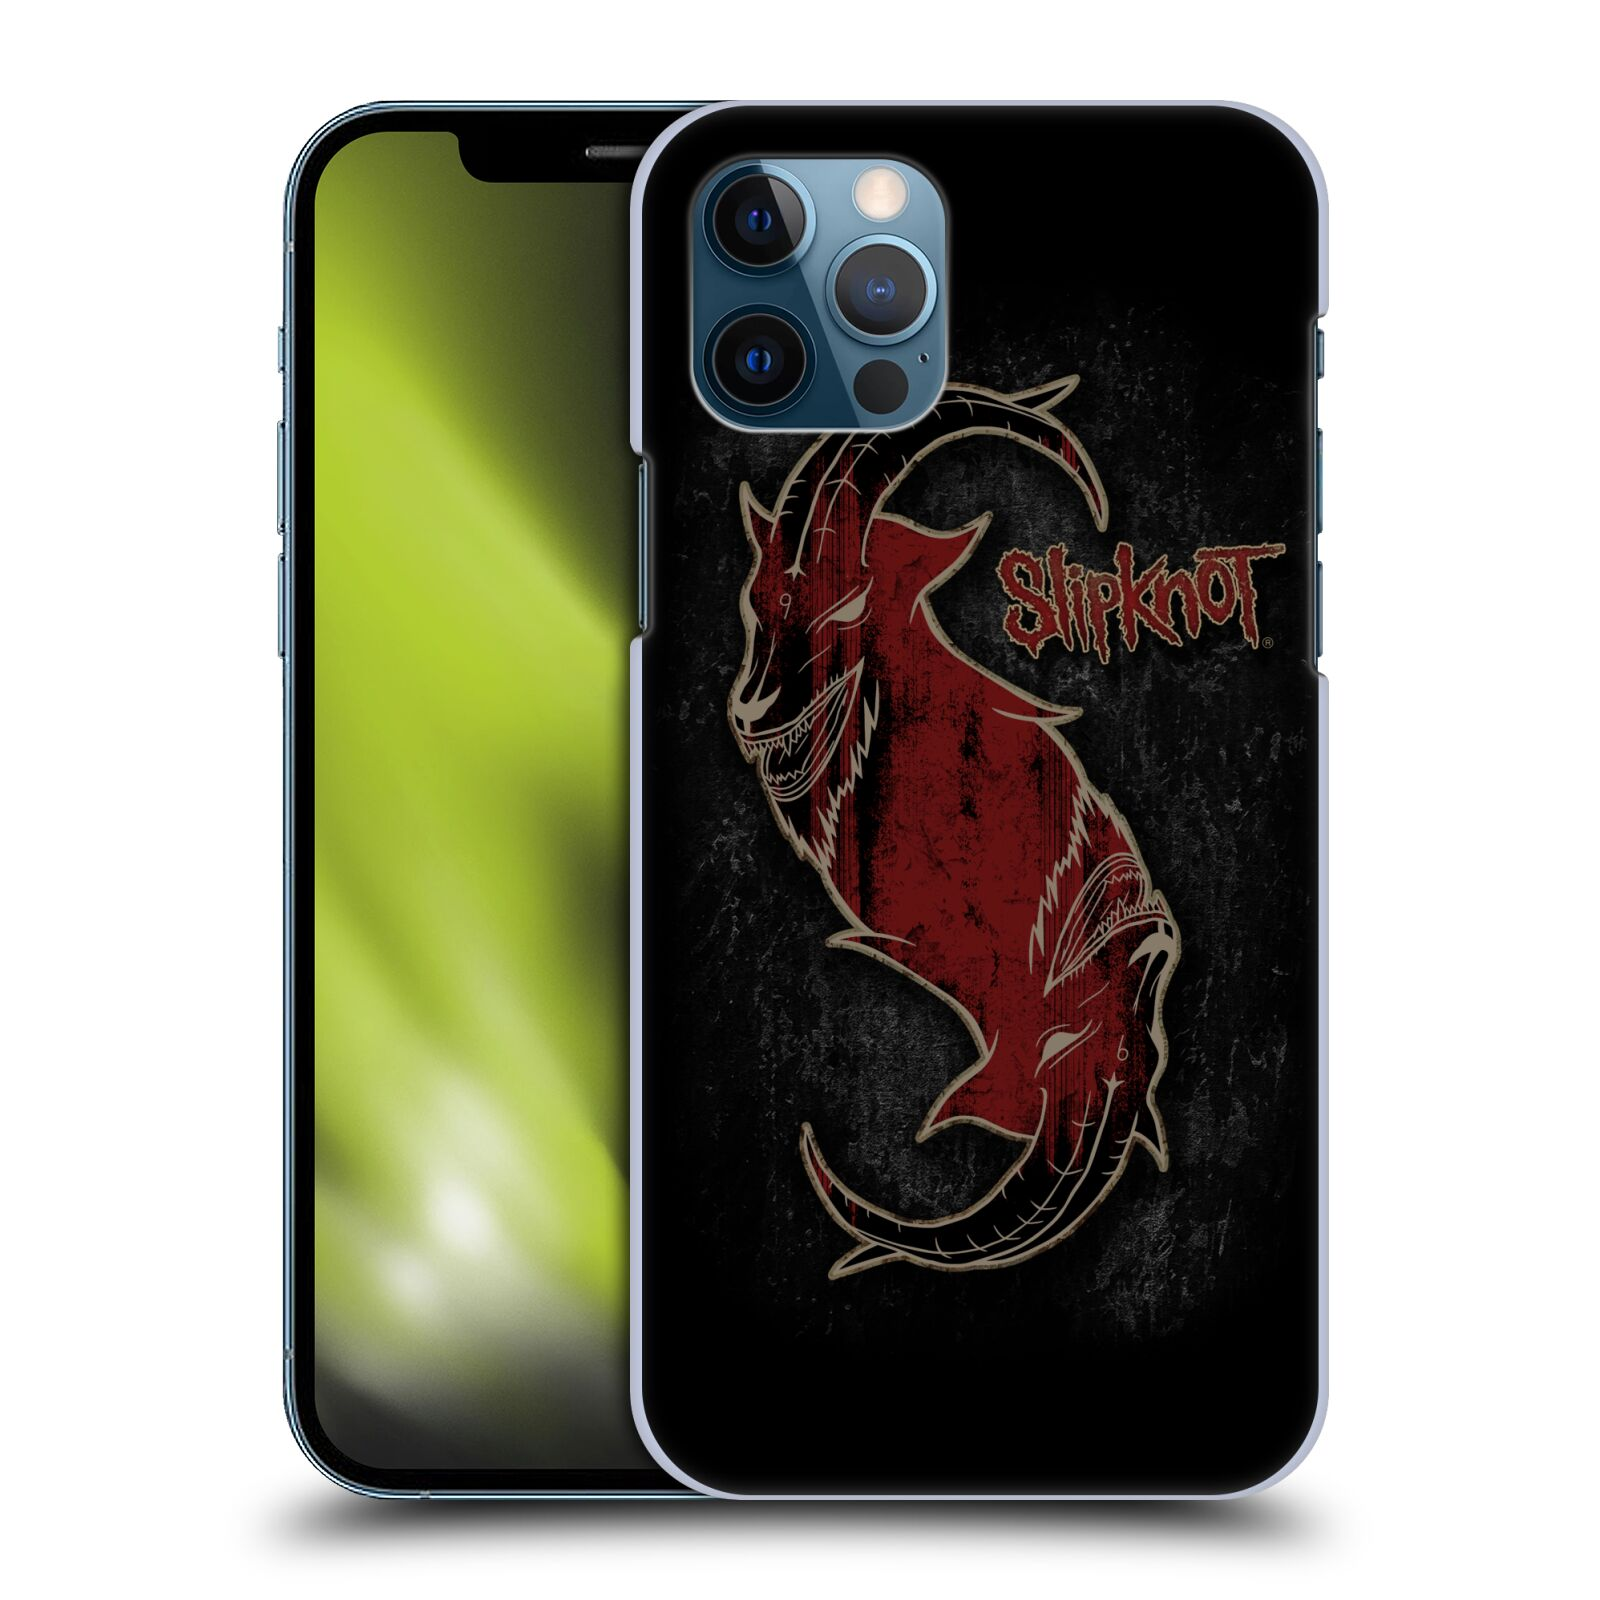 Plastové pouzdro na mobil Apple iPhone 12 / 12 Pro - Head Case - Slipknot - Rudý kozel